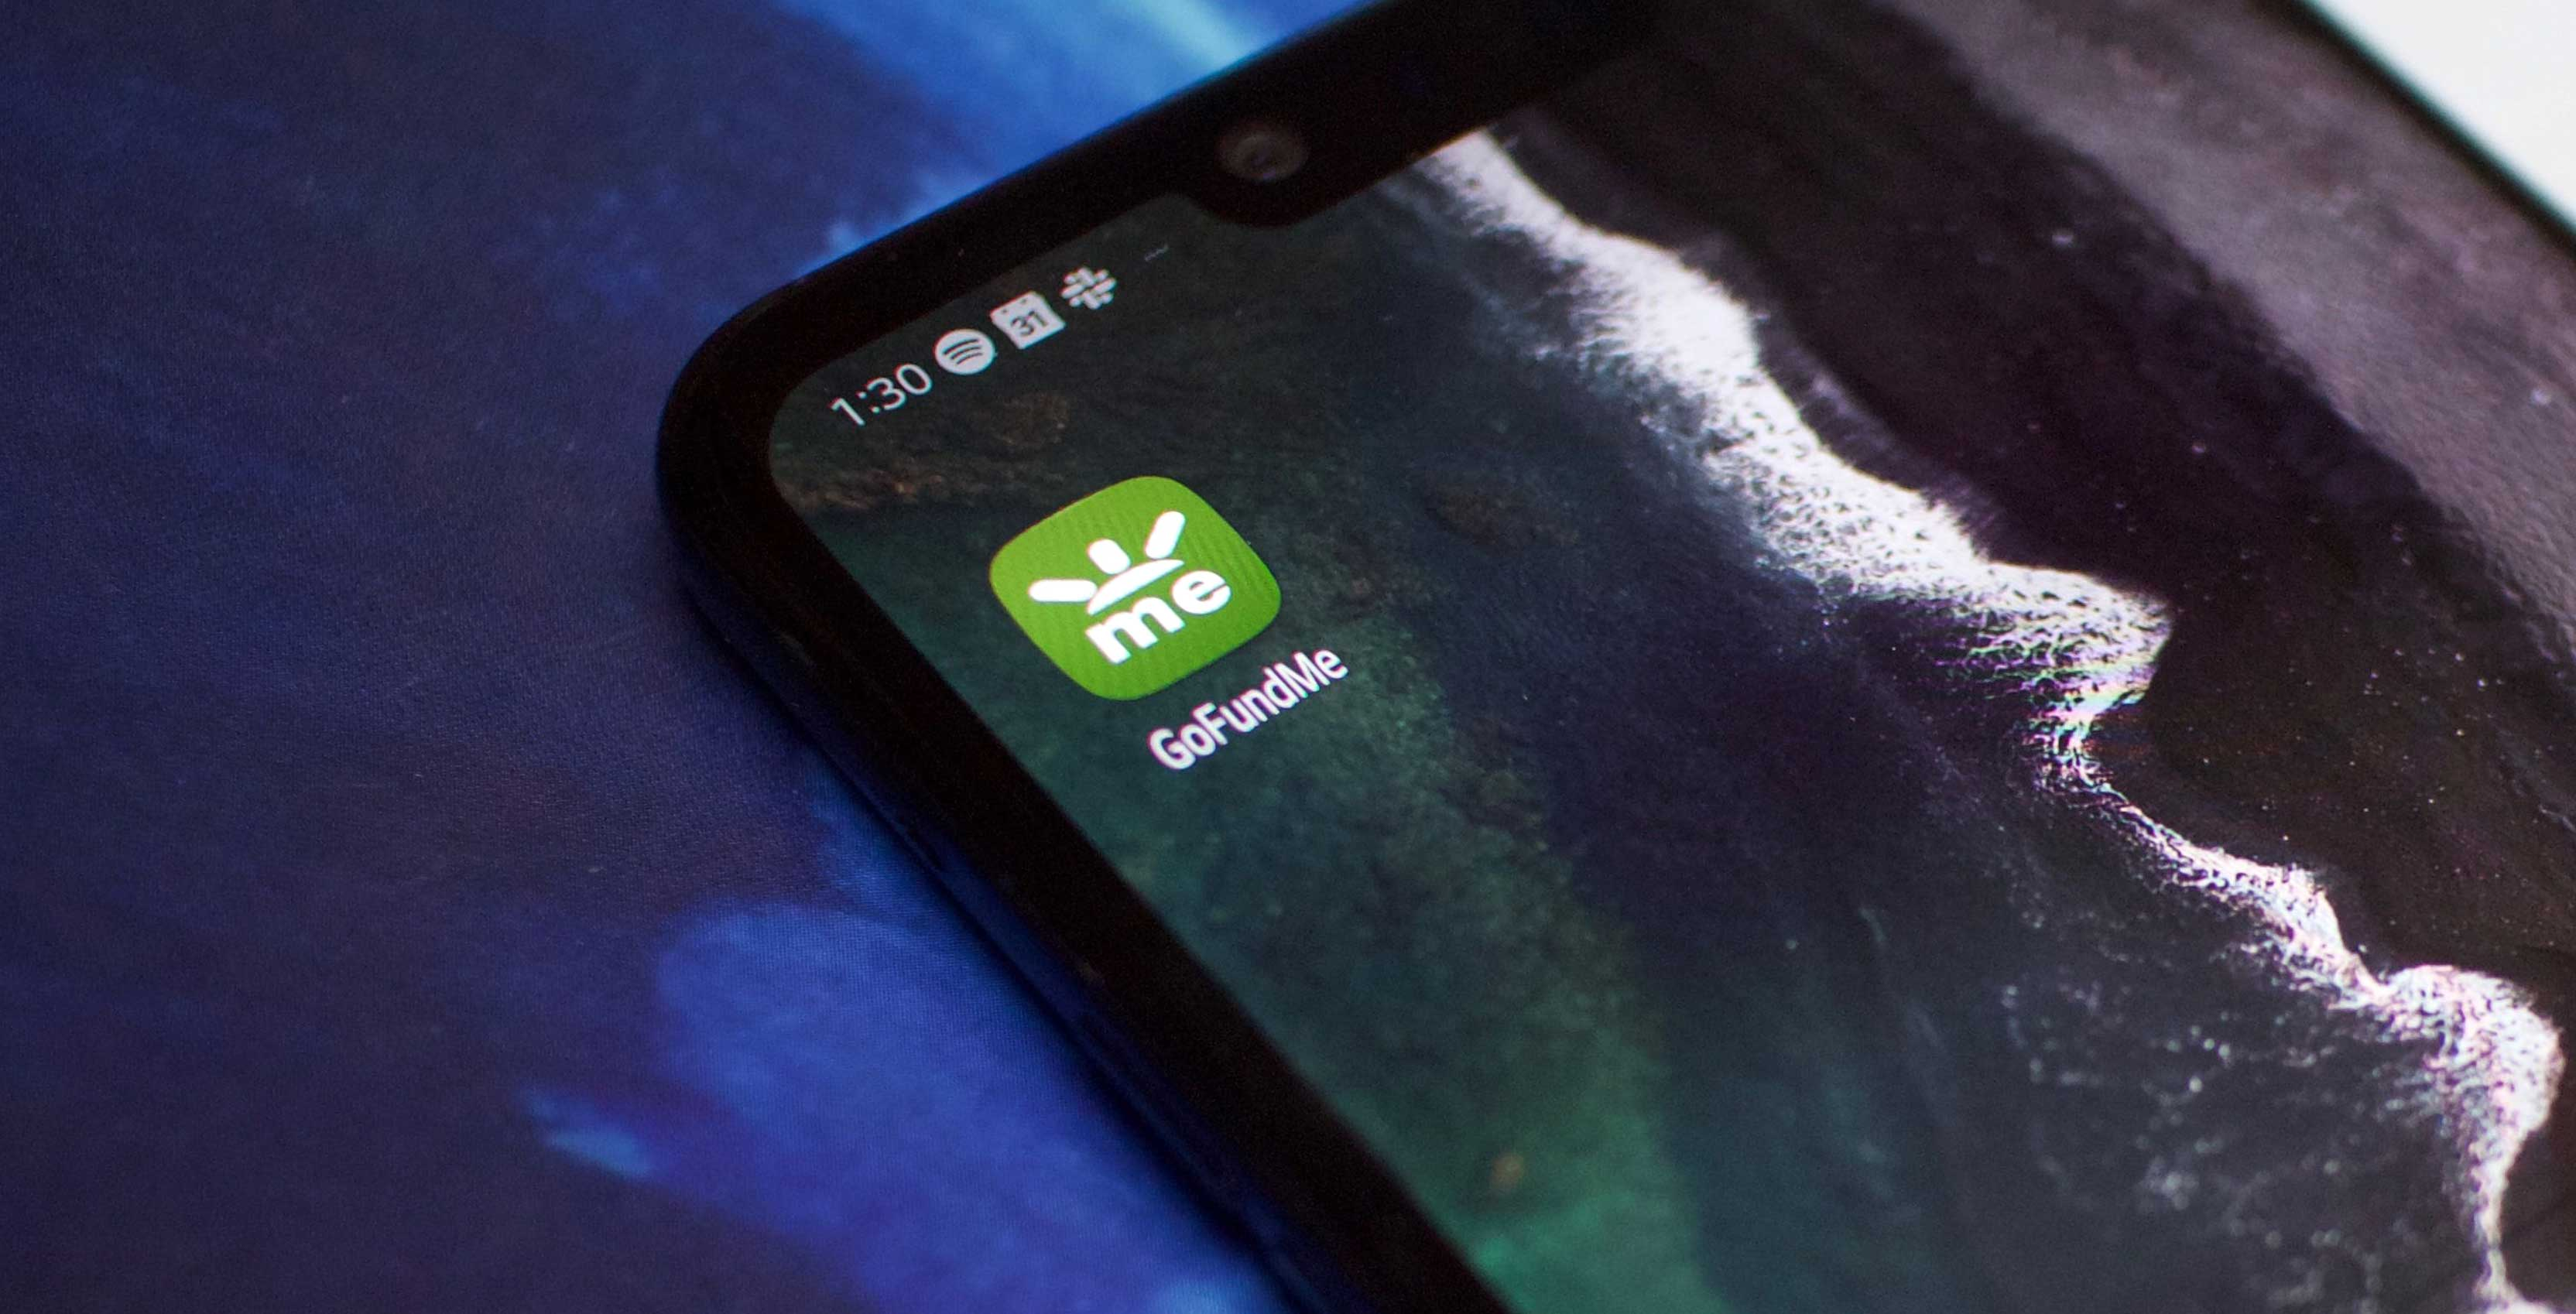 phone with GoFundMe app